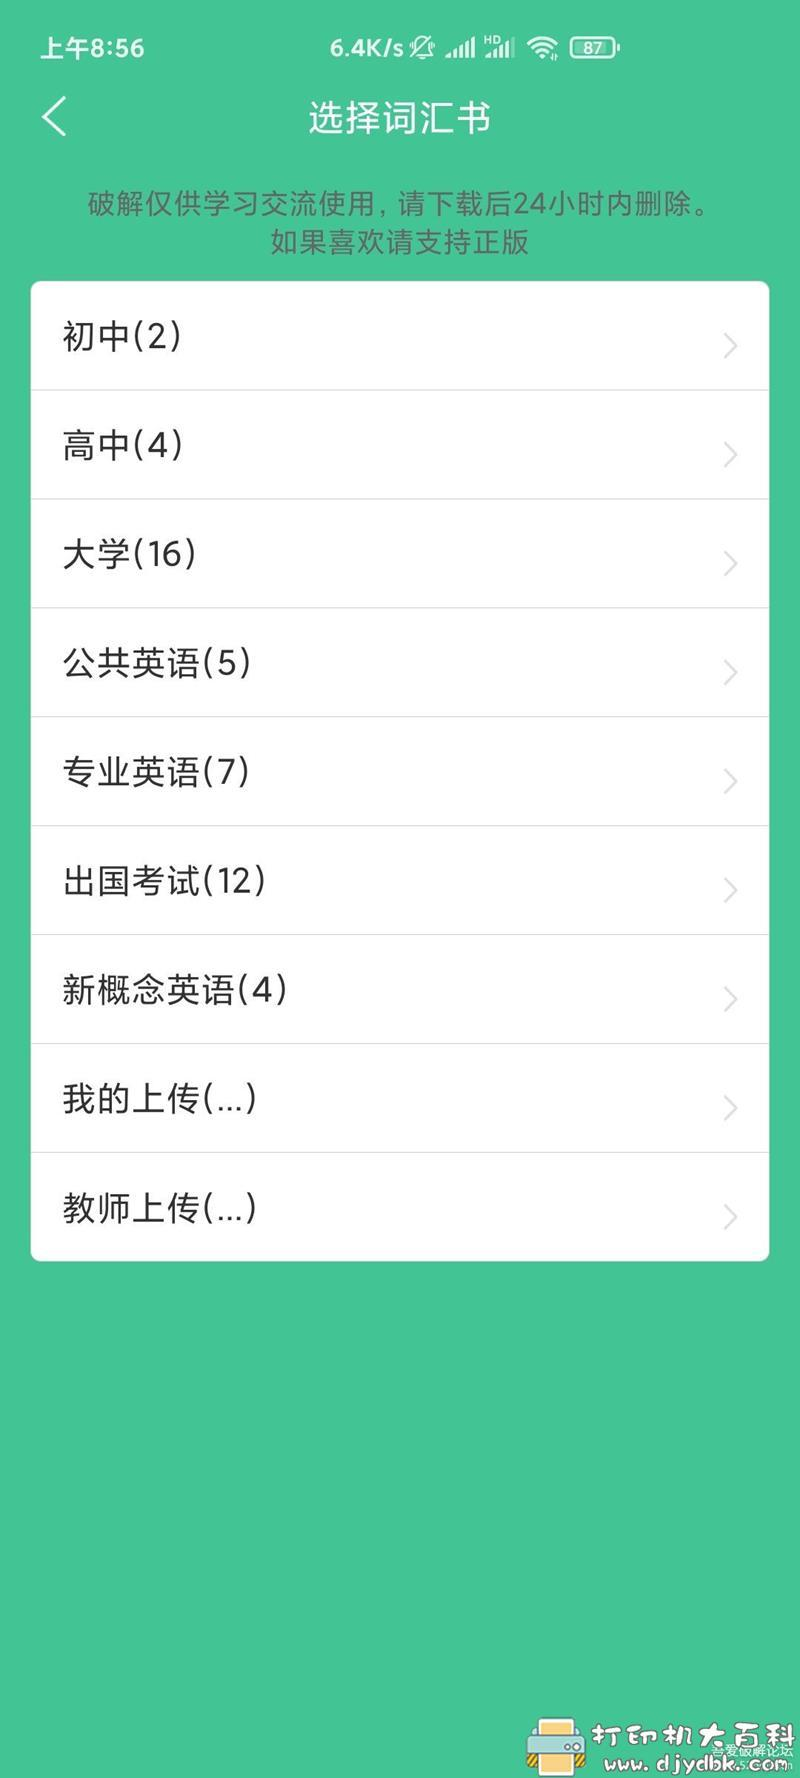 [Android]知米背单词畅享版 配图 No.2